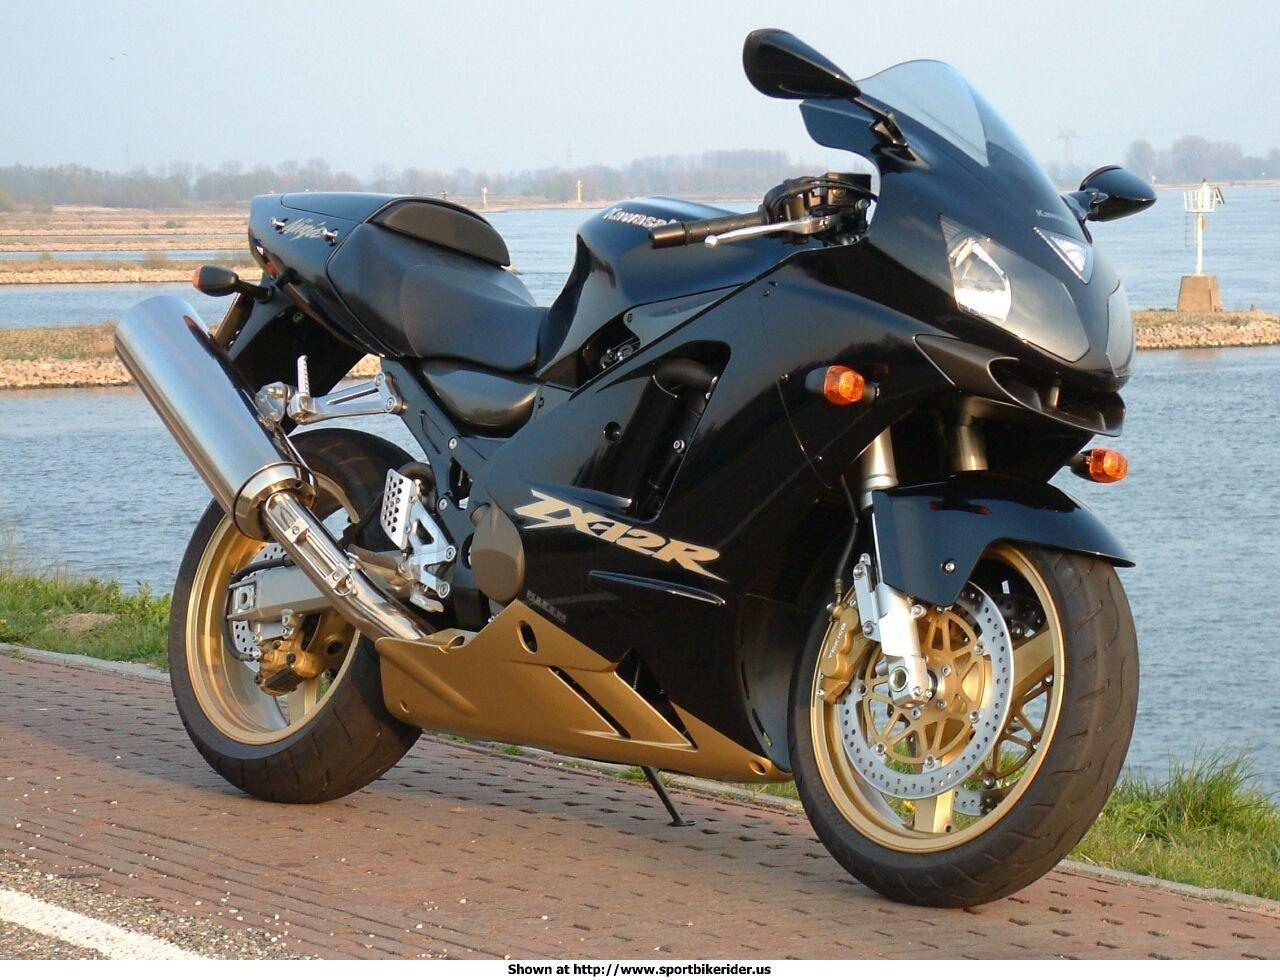 2002 ZX12R Touring motorcycles, Sport bikes, Honda